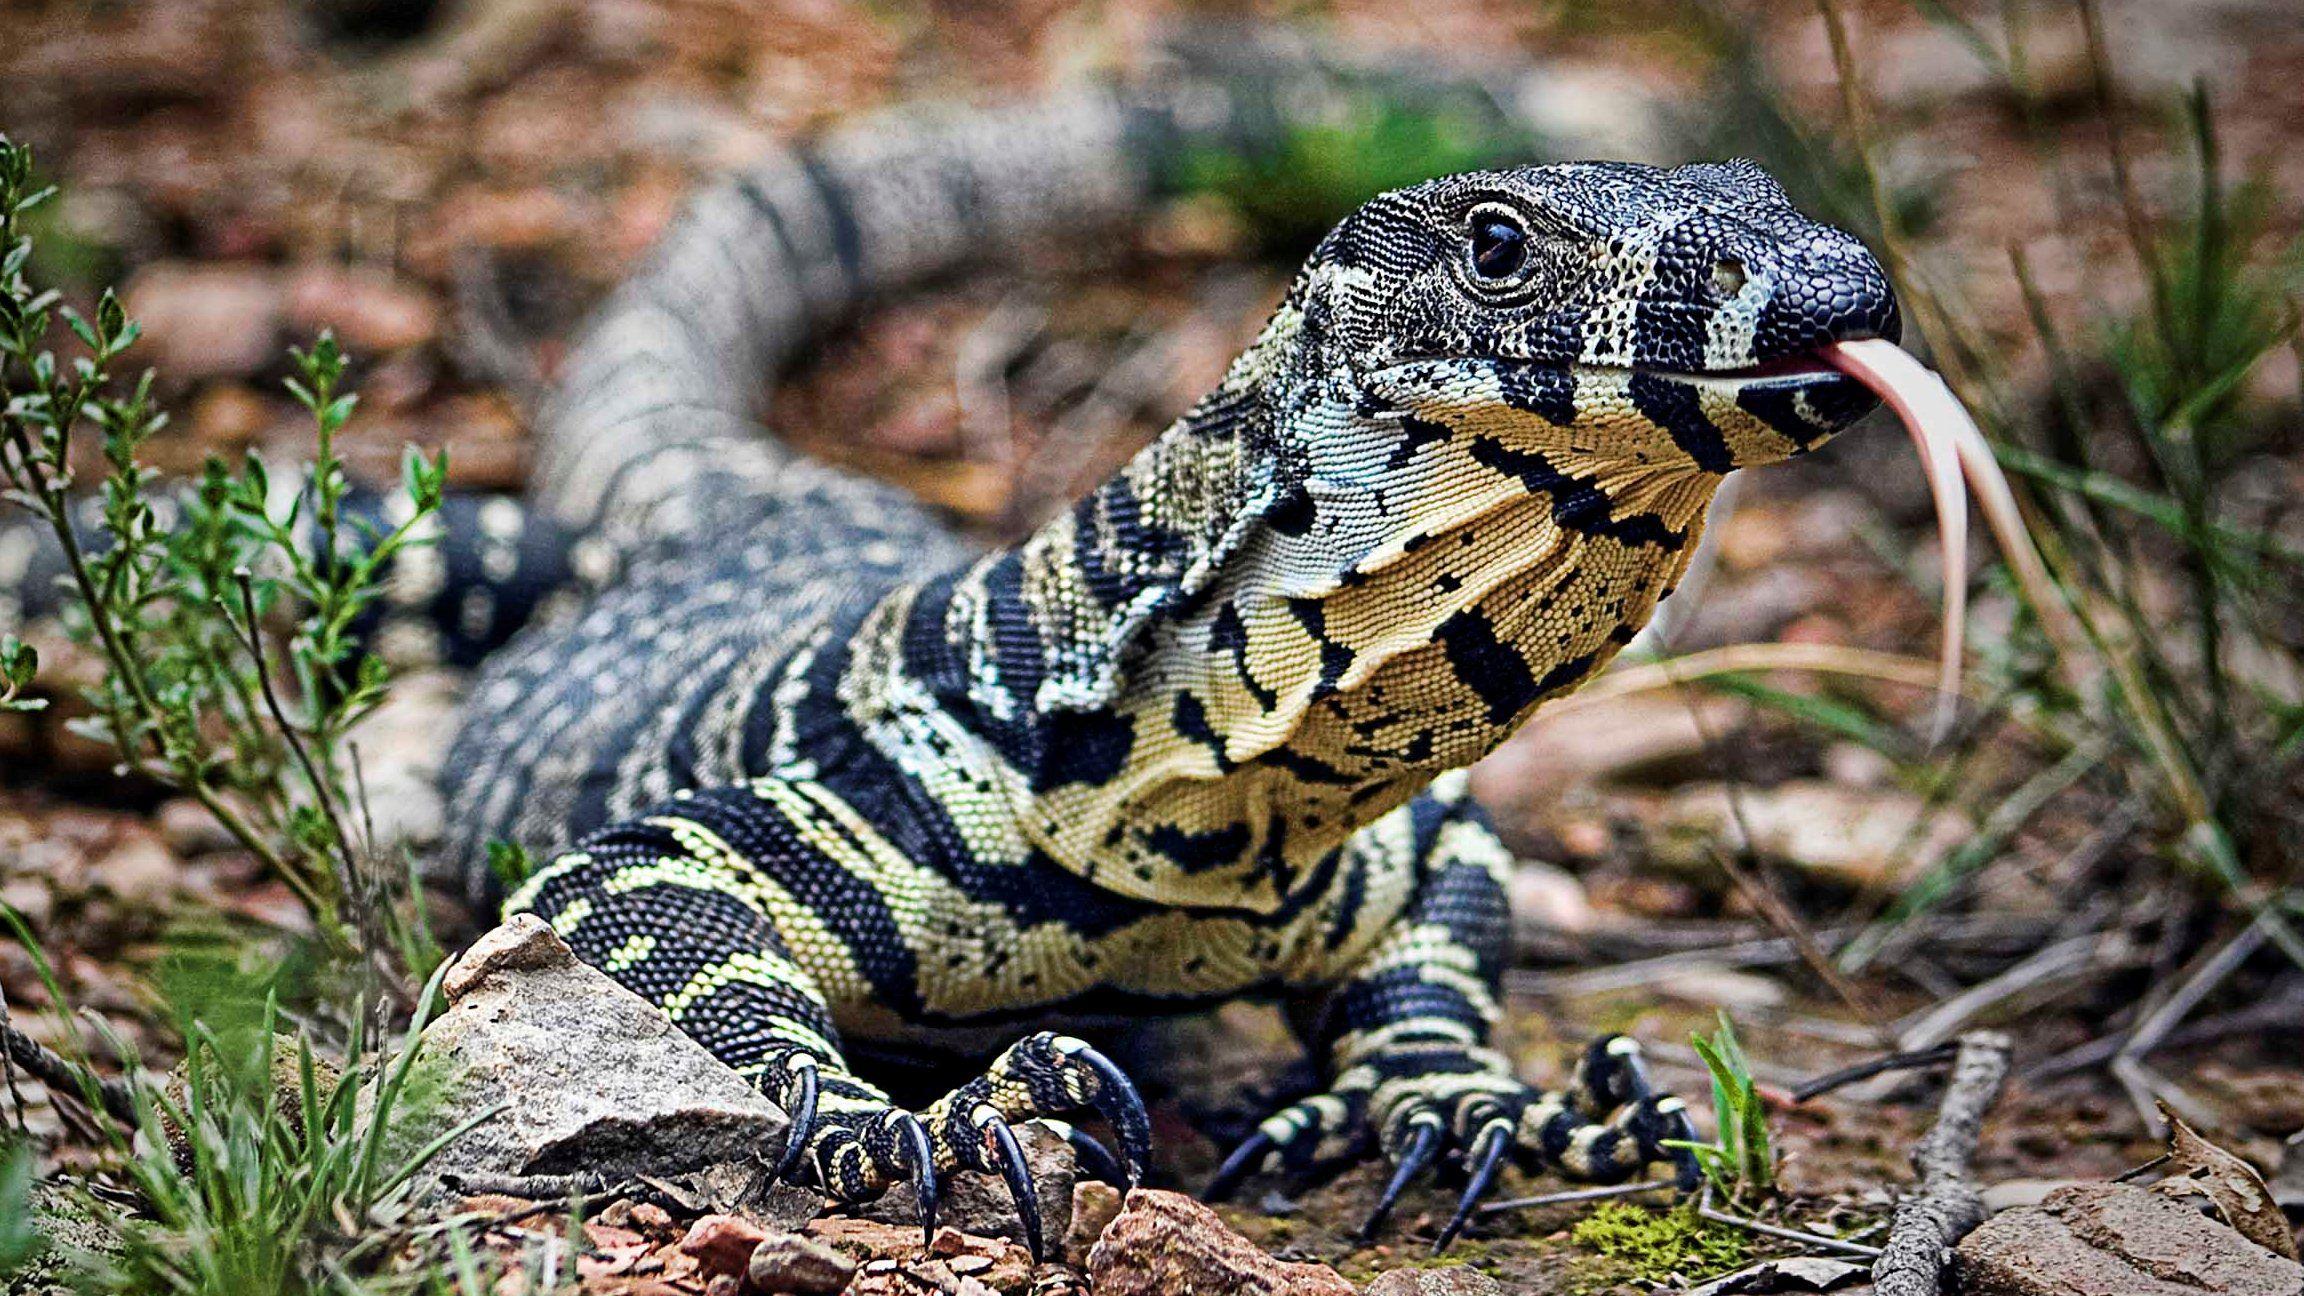 - Reptiles